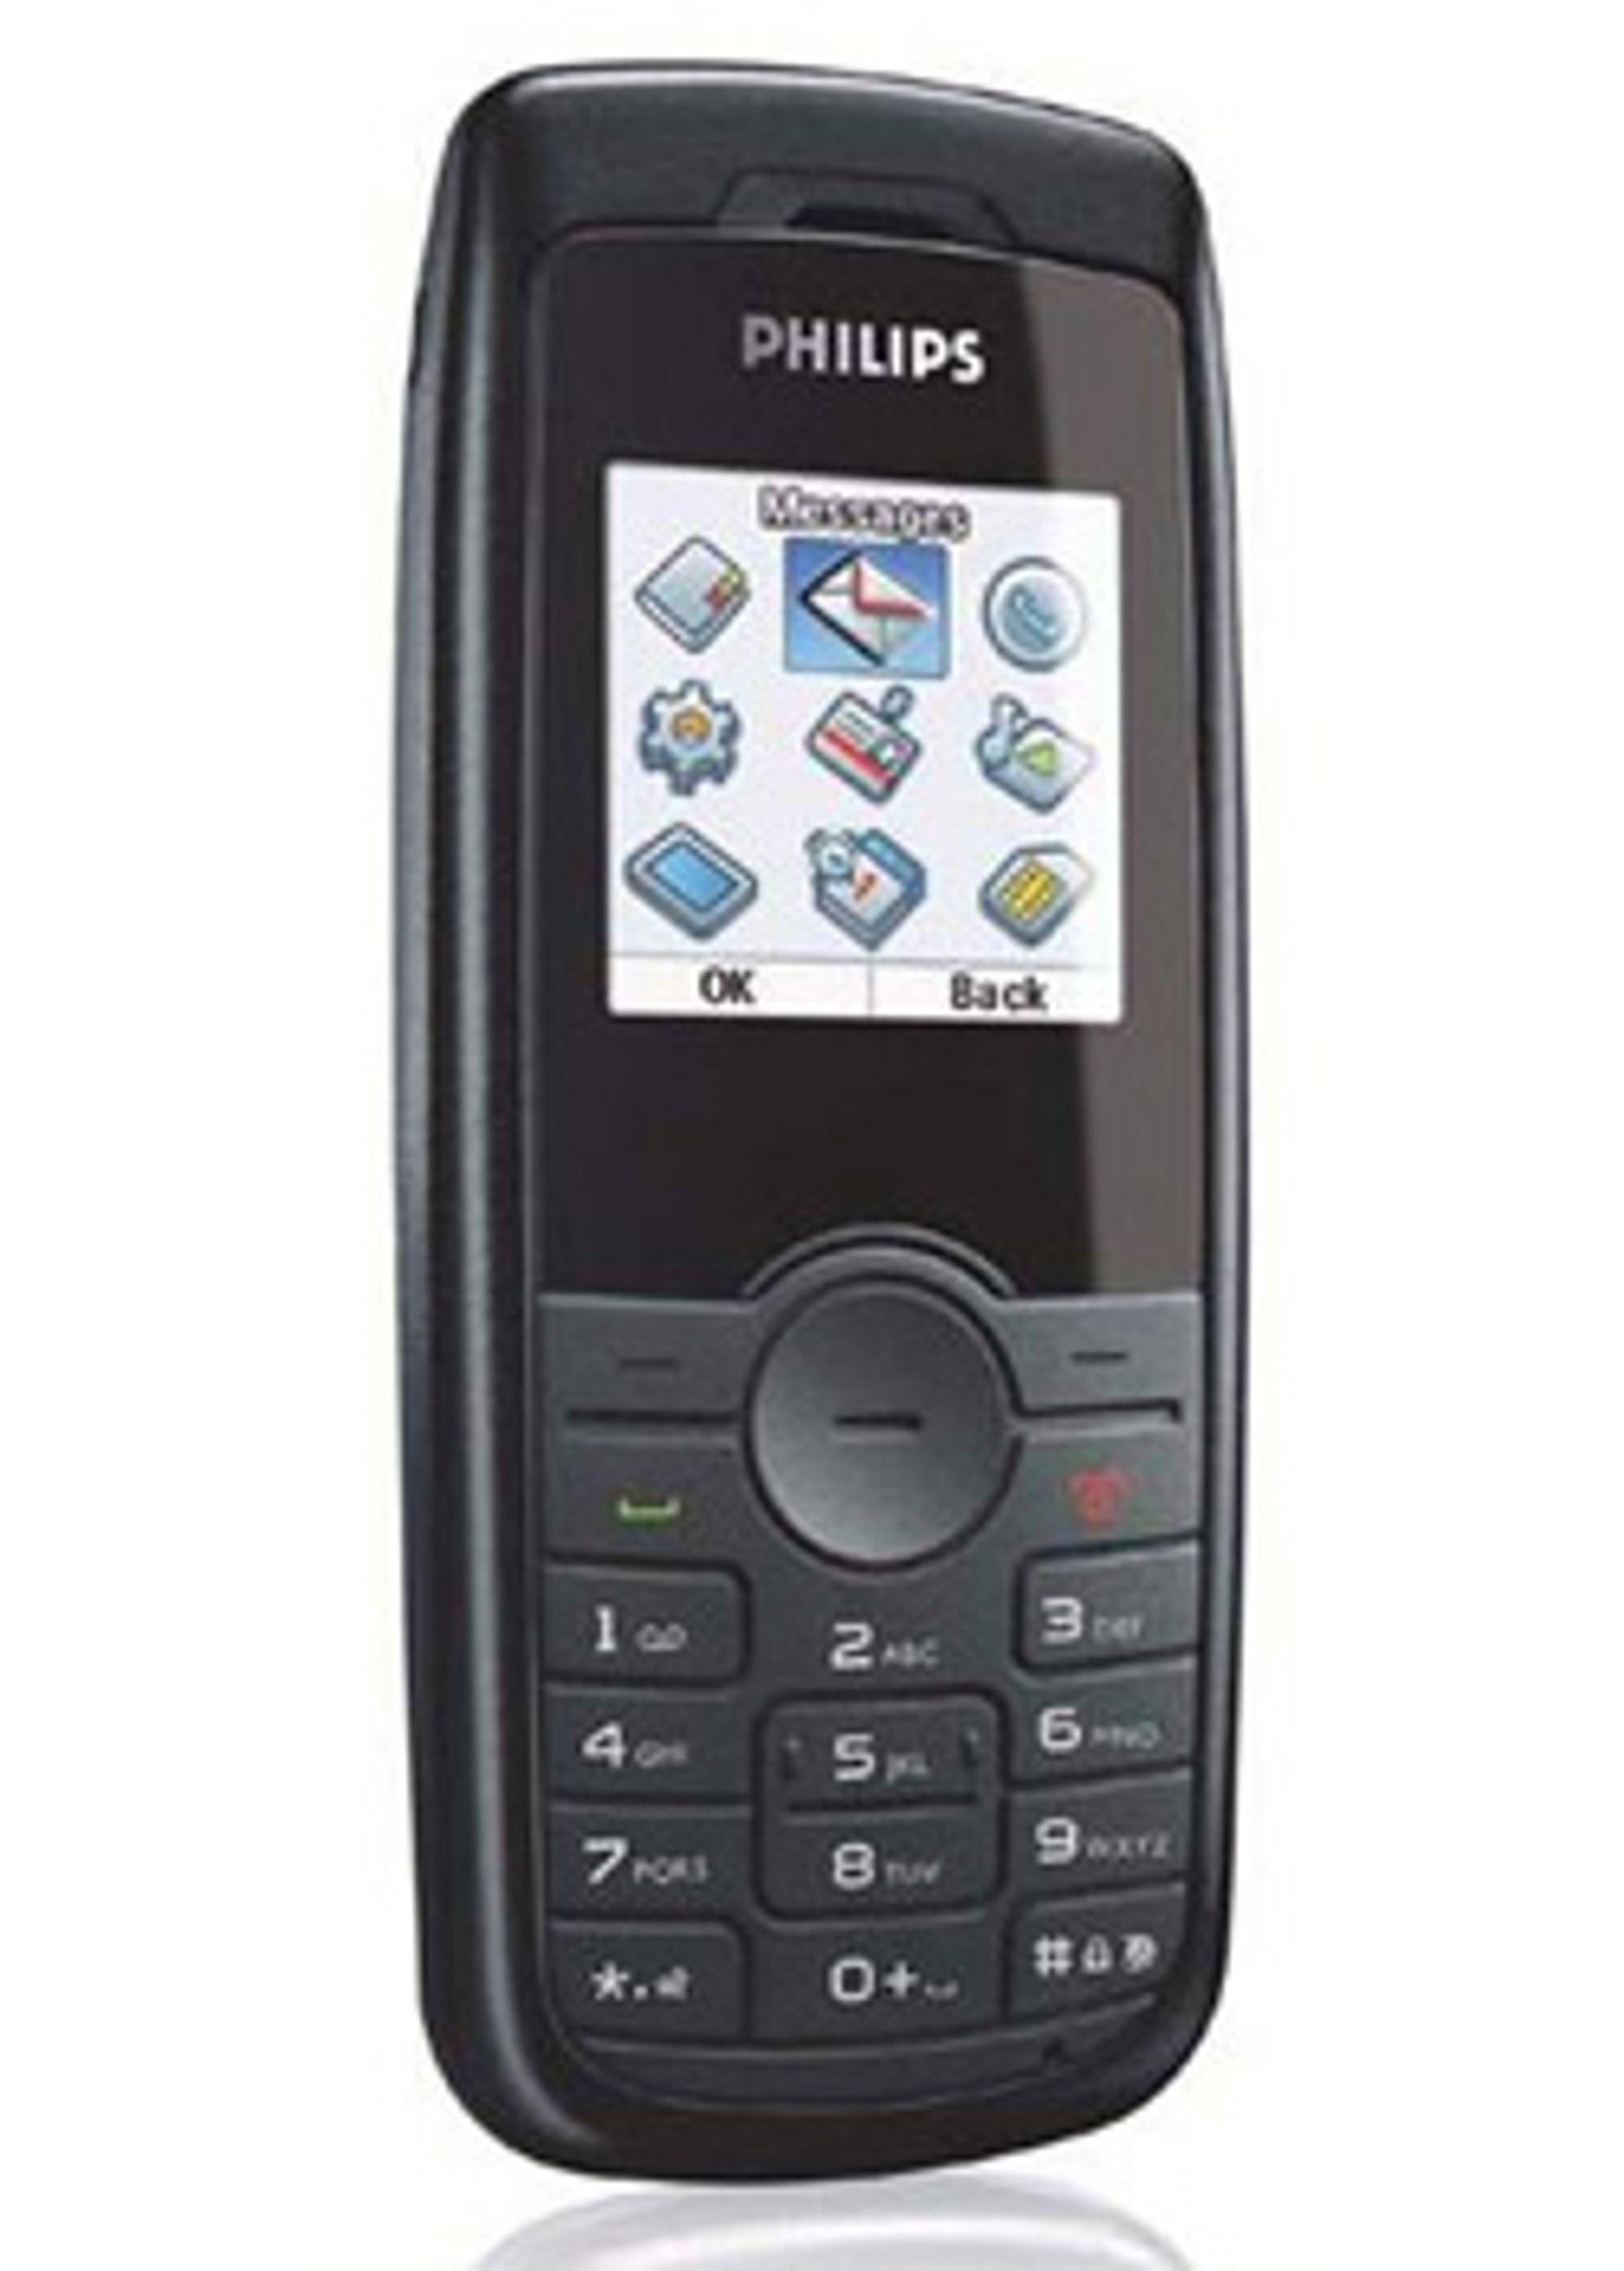 Philips' 192 Candybar er en enke telefon. (Foto: Unwired View)